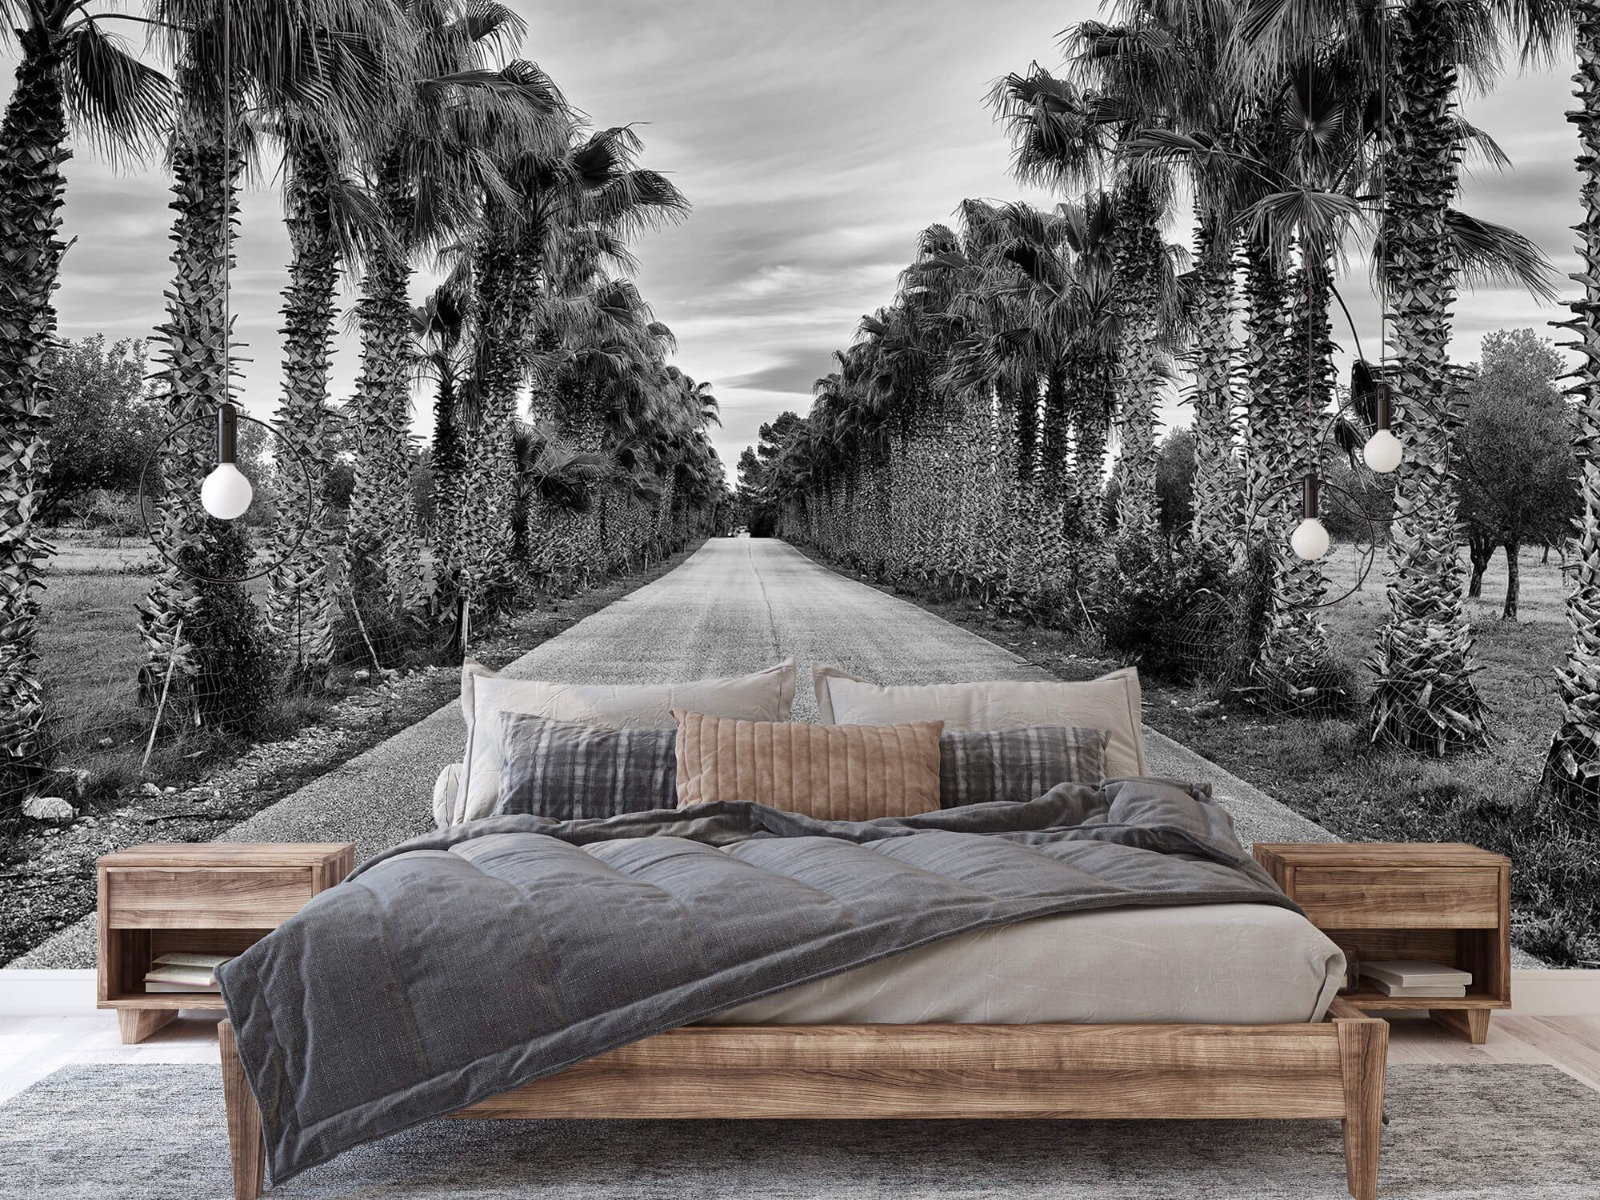 Palmbomen - Straat met palmbomen - Woonkamer 2